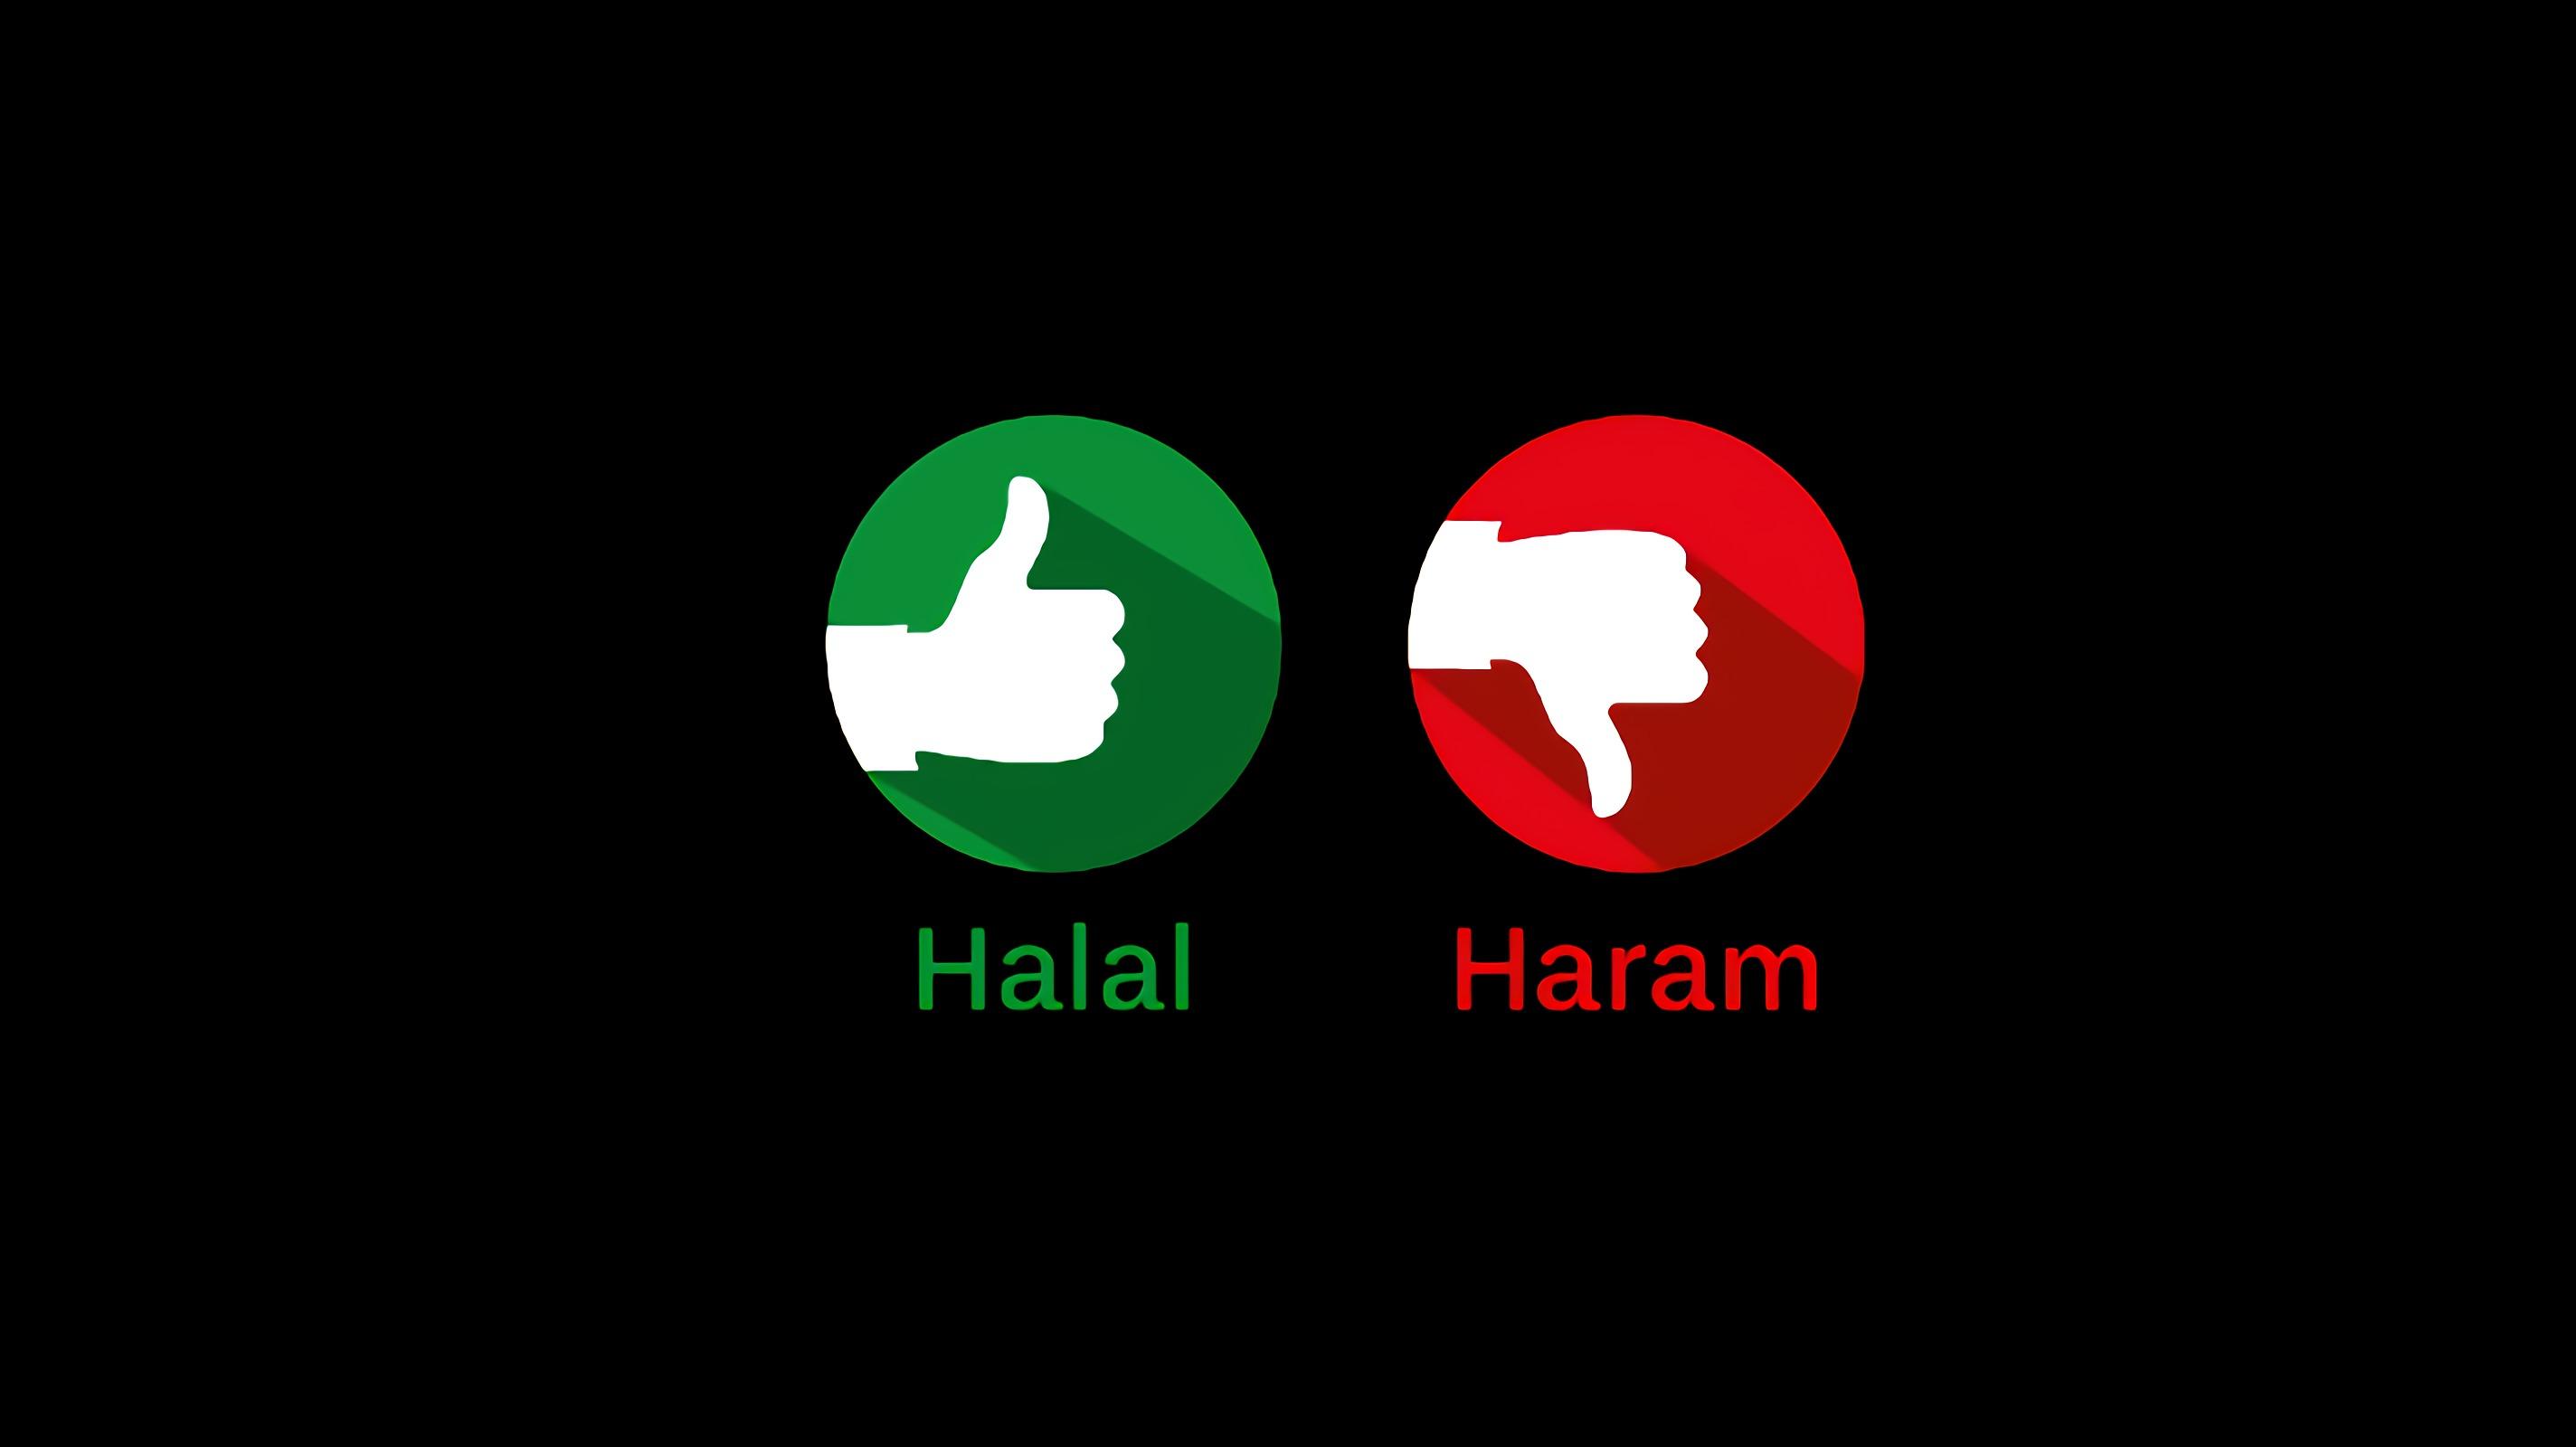 Sesuatu yang Halal Tidak Membutuhkan yang Haram. Apa Maksudnya?